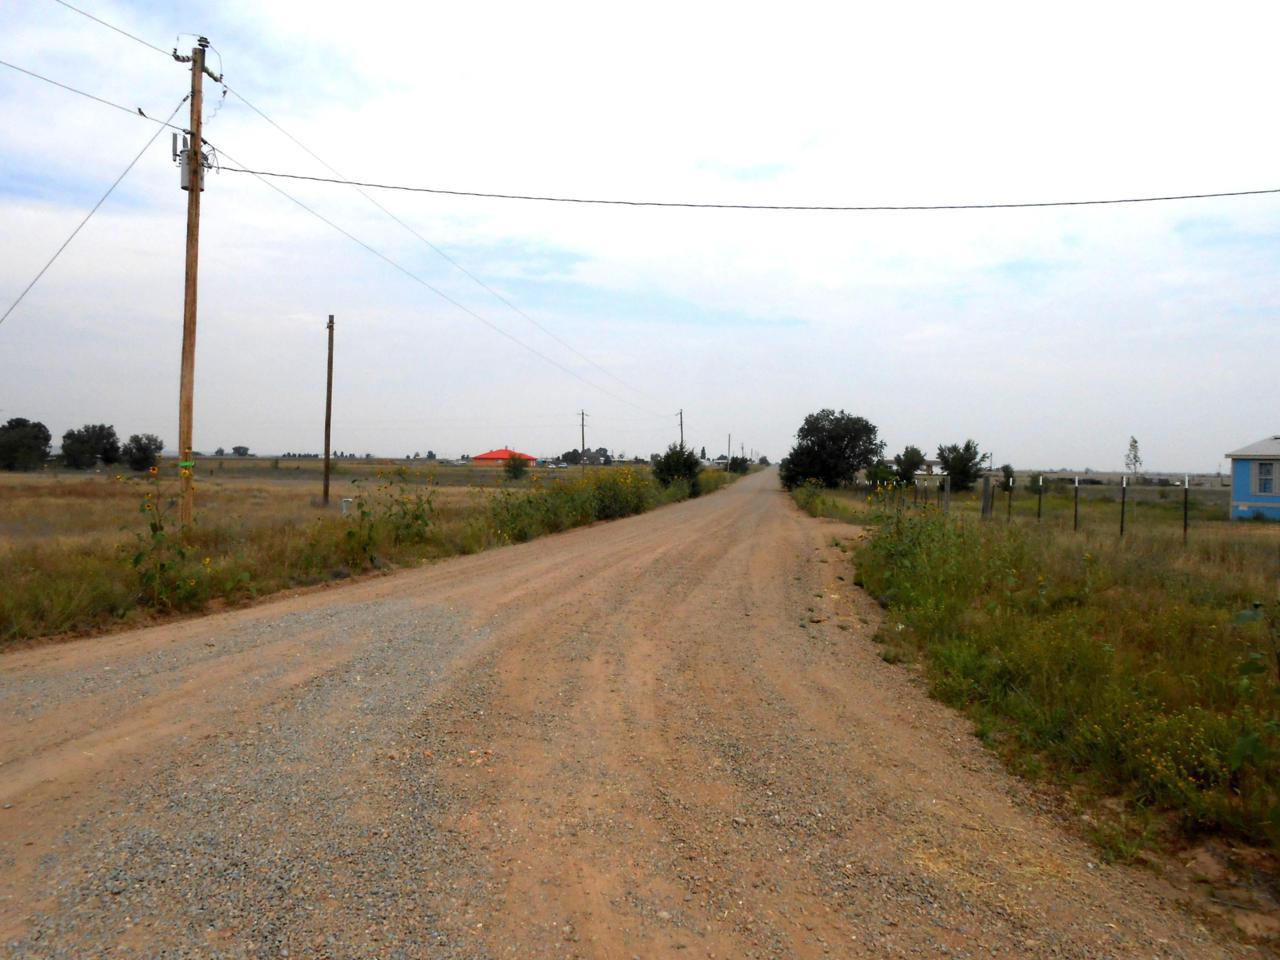 LOT 7-A Pumpkin Patch Road - Photo 1